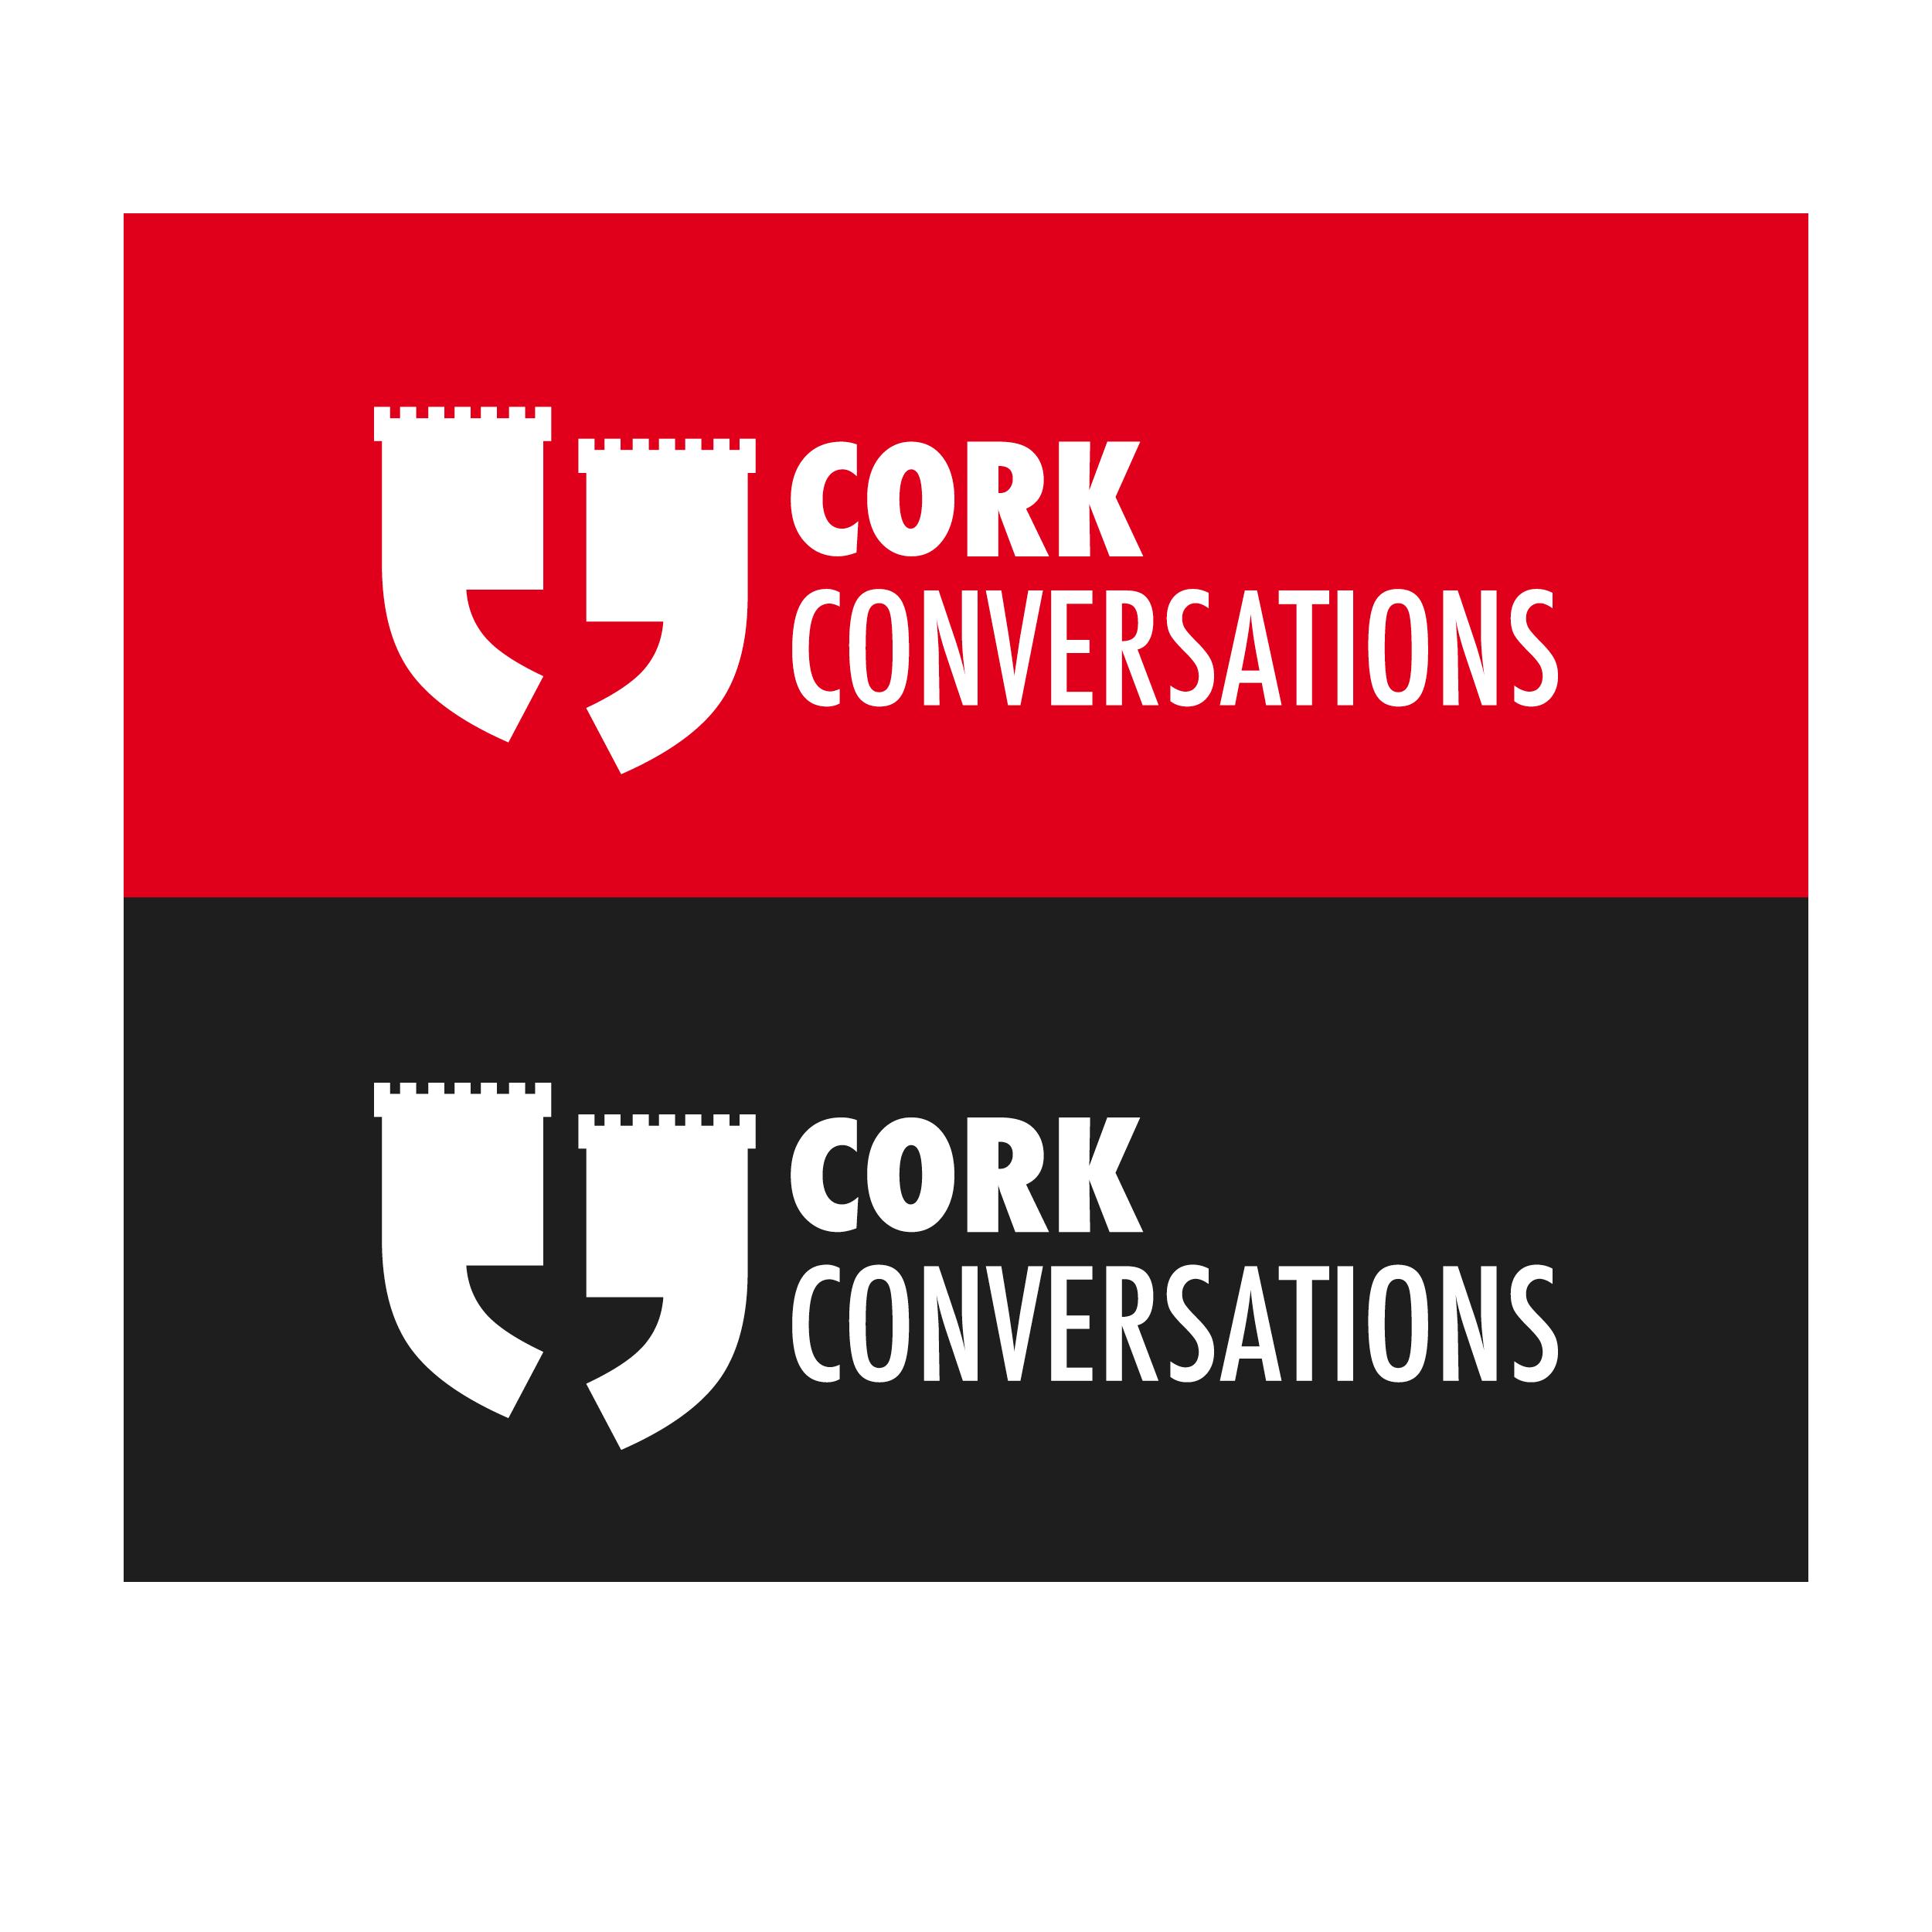 cor-conv-2-logos_.png